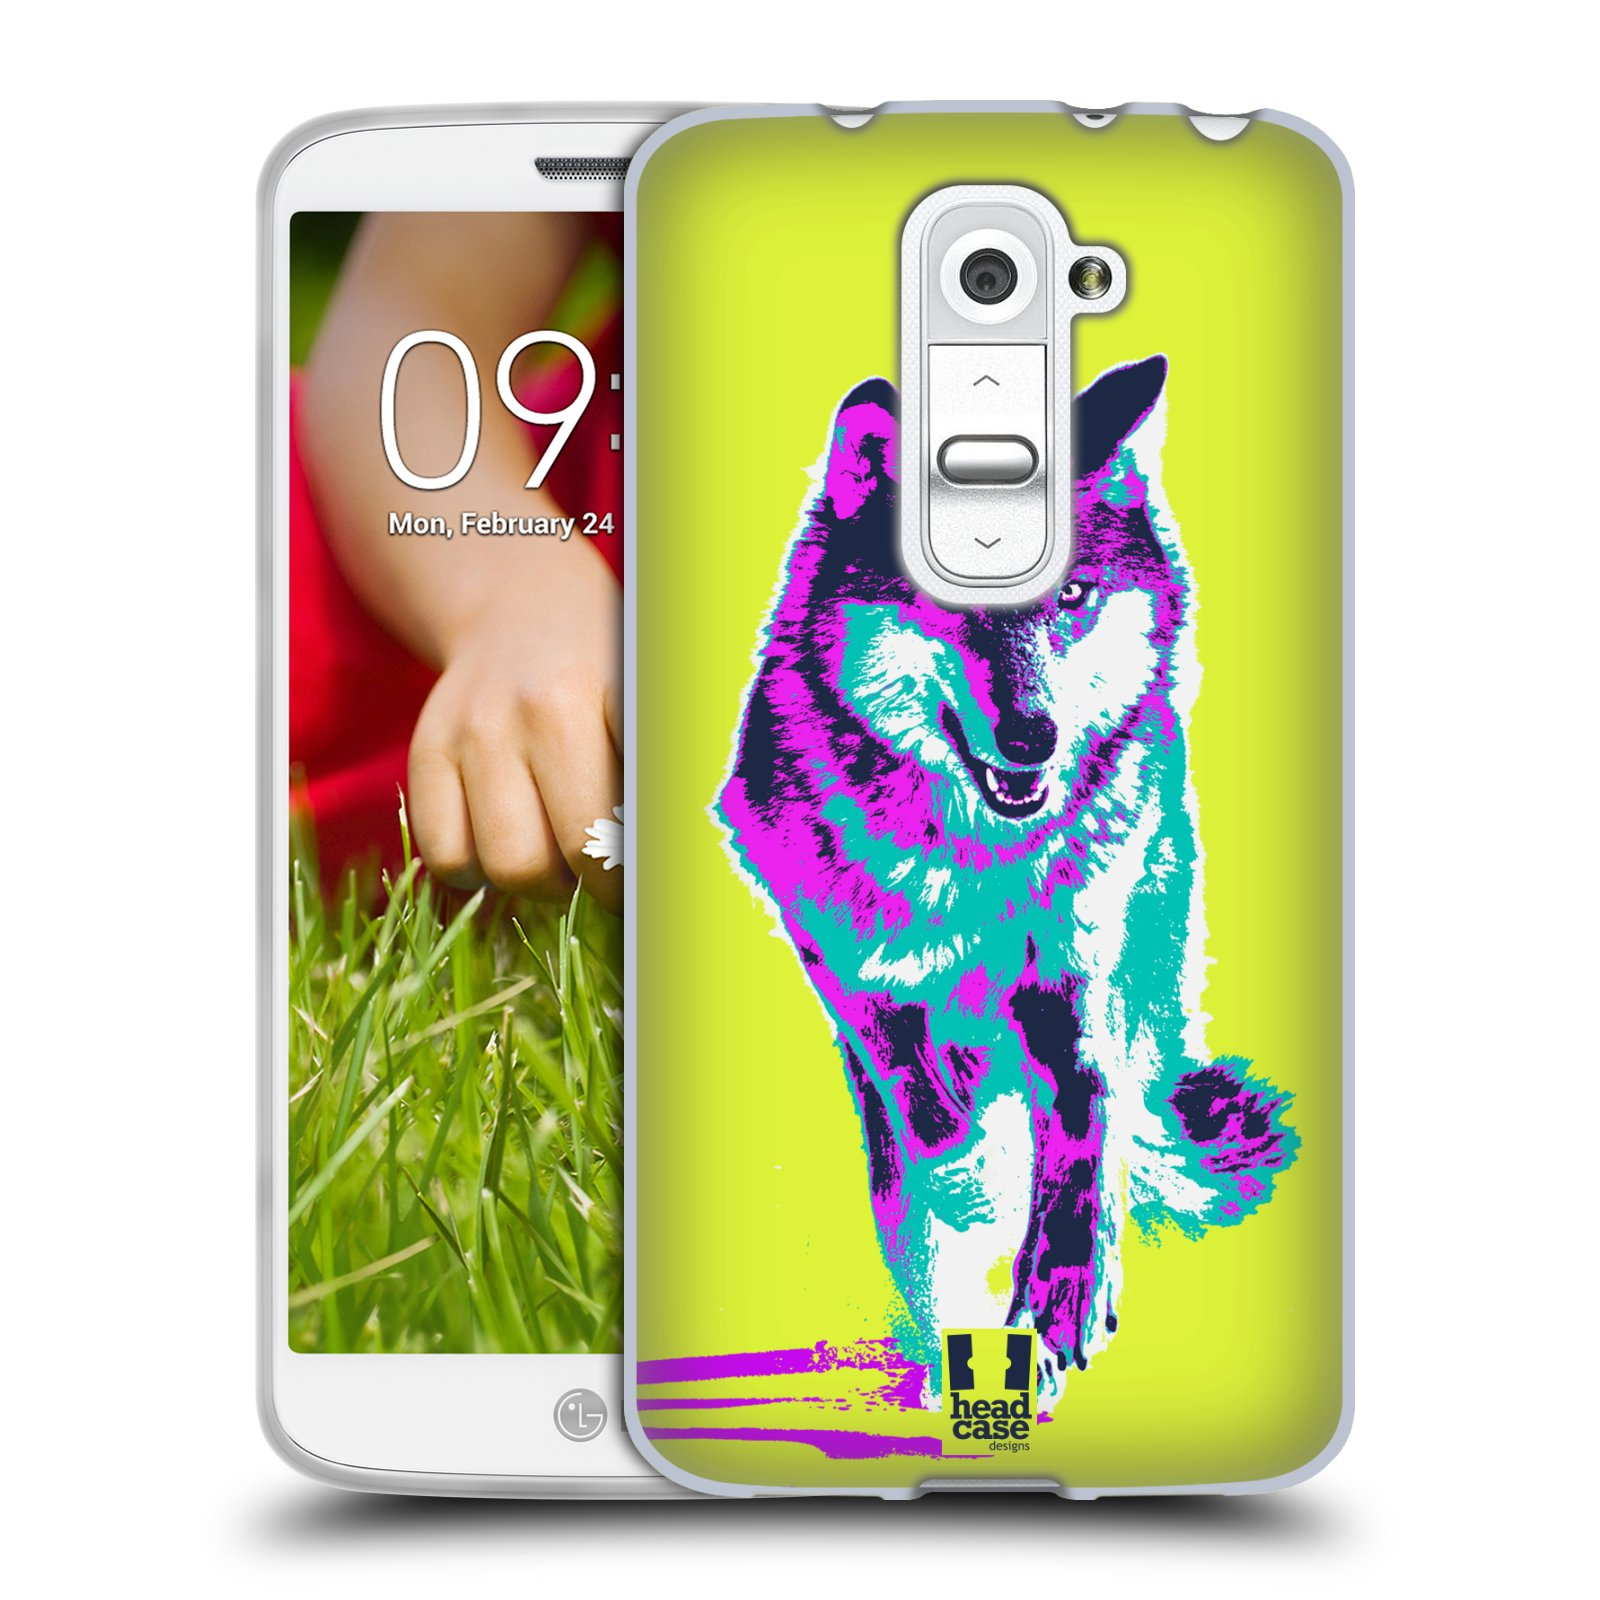 Silikonové pouzdro na mobil LG G2 Mini HEAD CASE POP PRINT VLK (Silikonový kryt či obal na mobilní telefon LG G2 Mini D620)